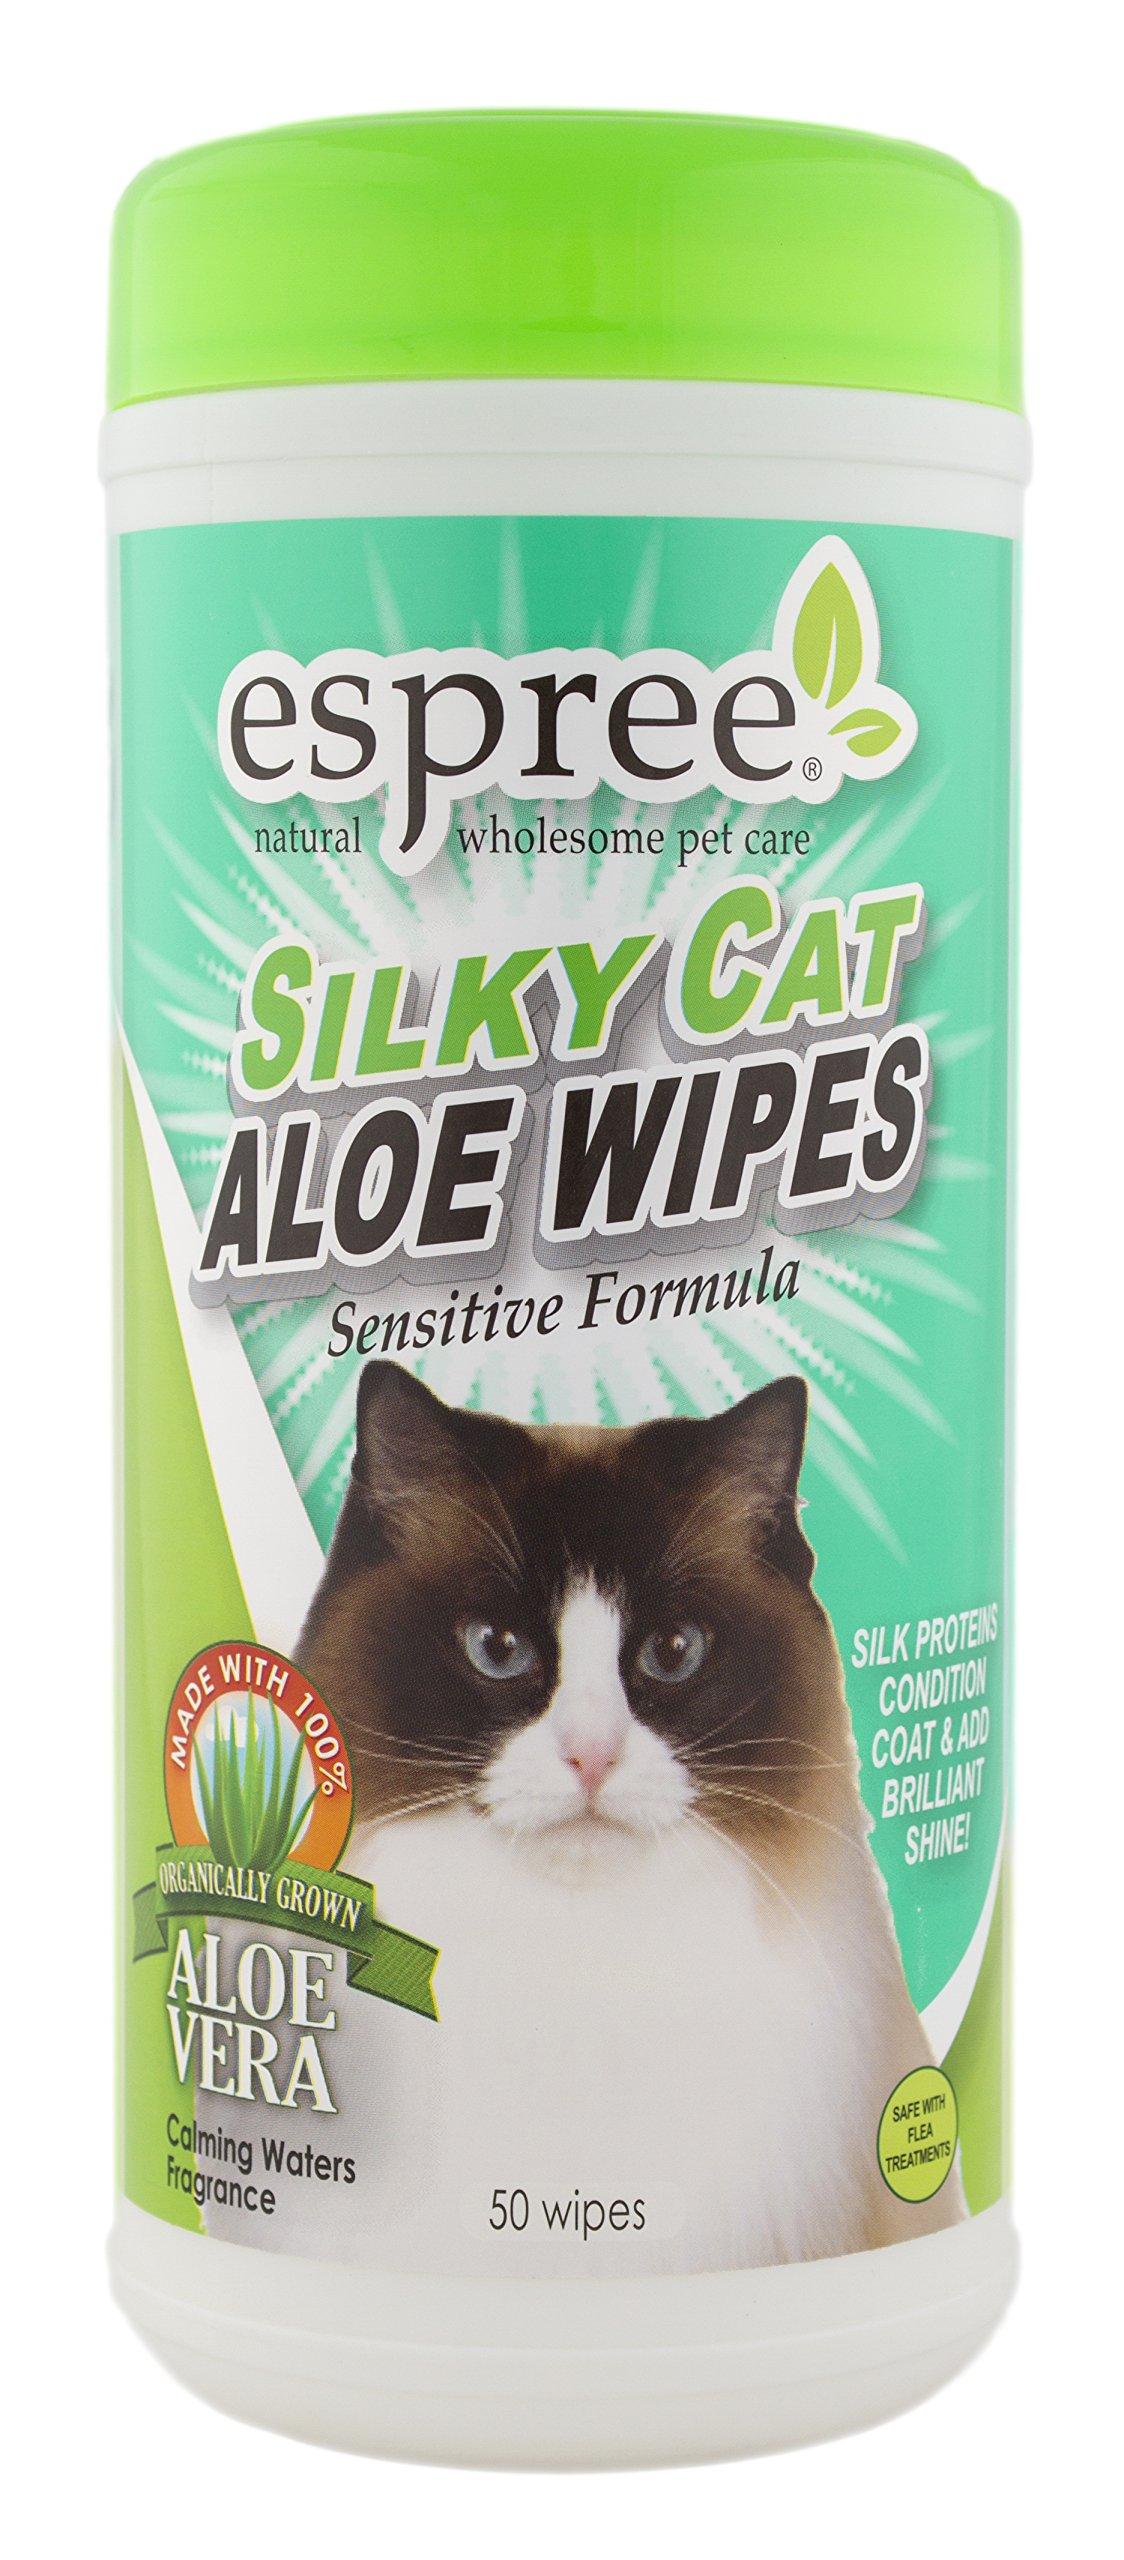 : Amazon.com: Espree Silky Cat Aloe Wipes, 50 count